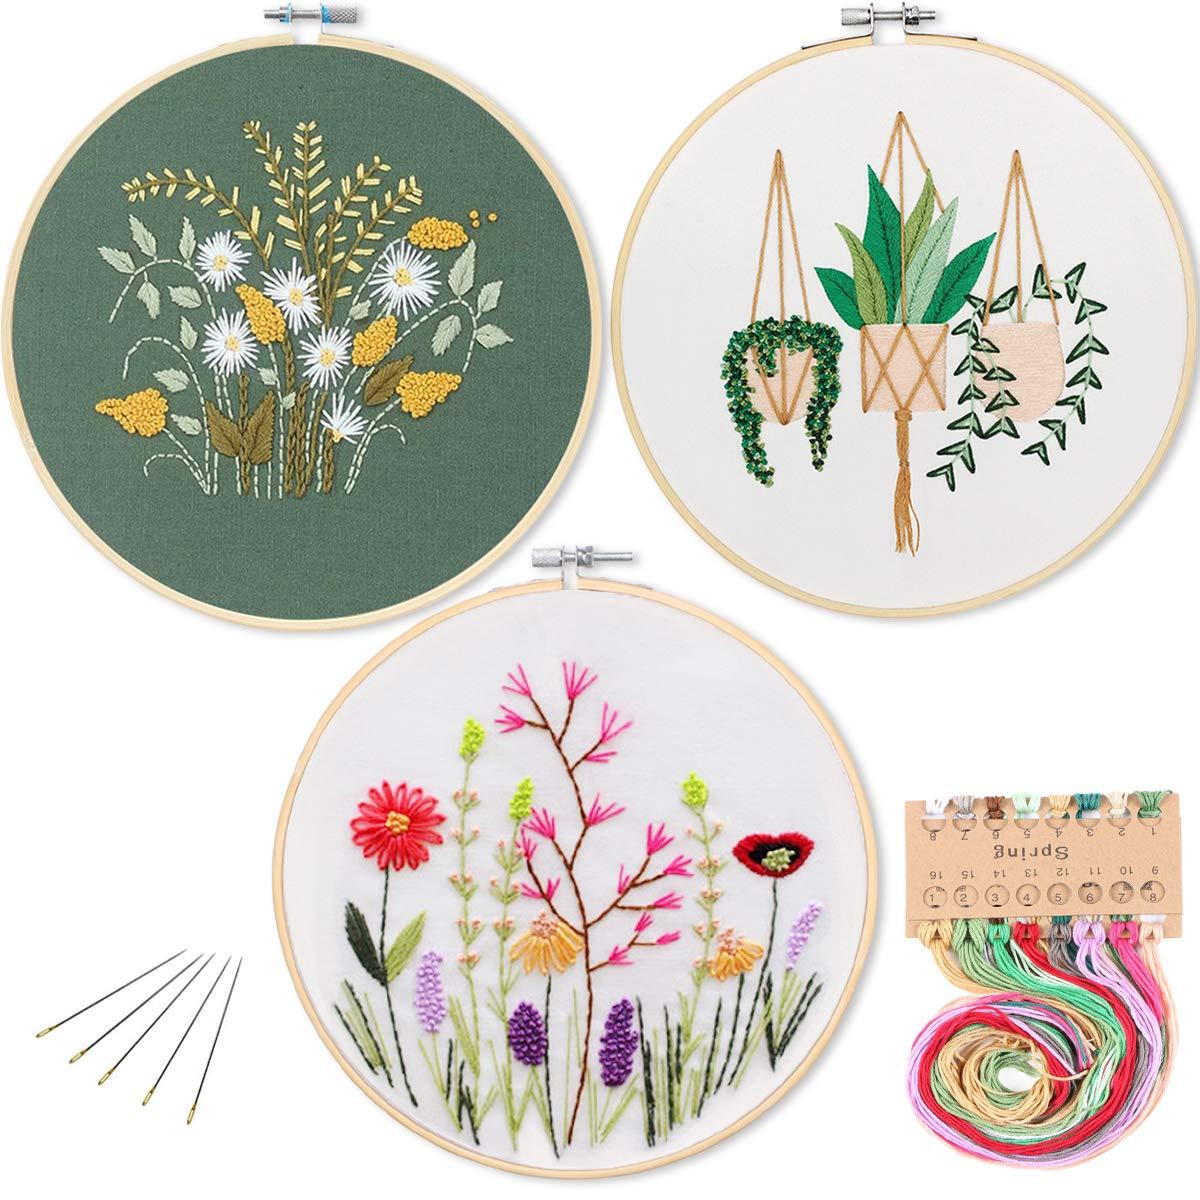 Embroidery Starter Pattern Kissbuty Stamped